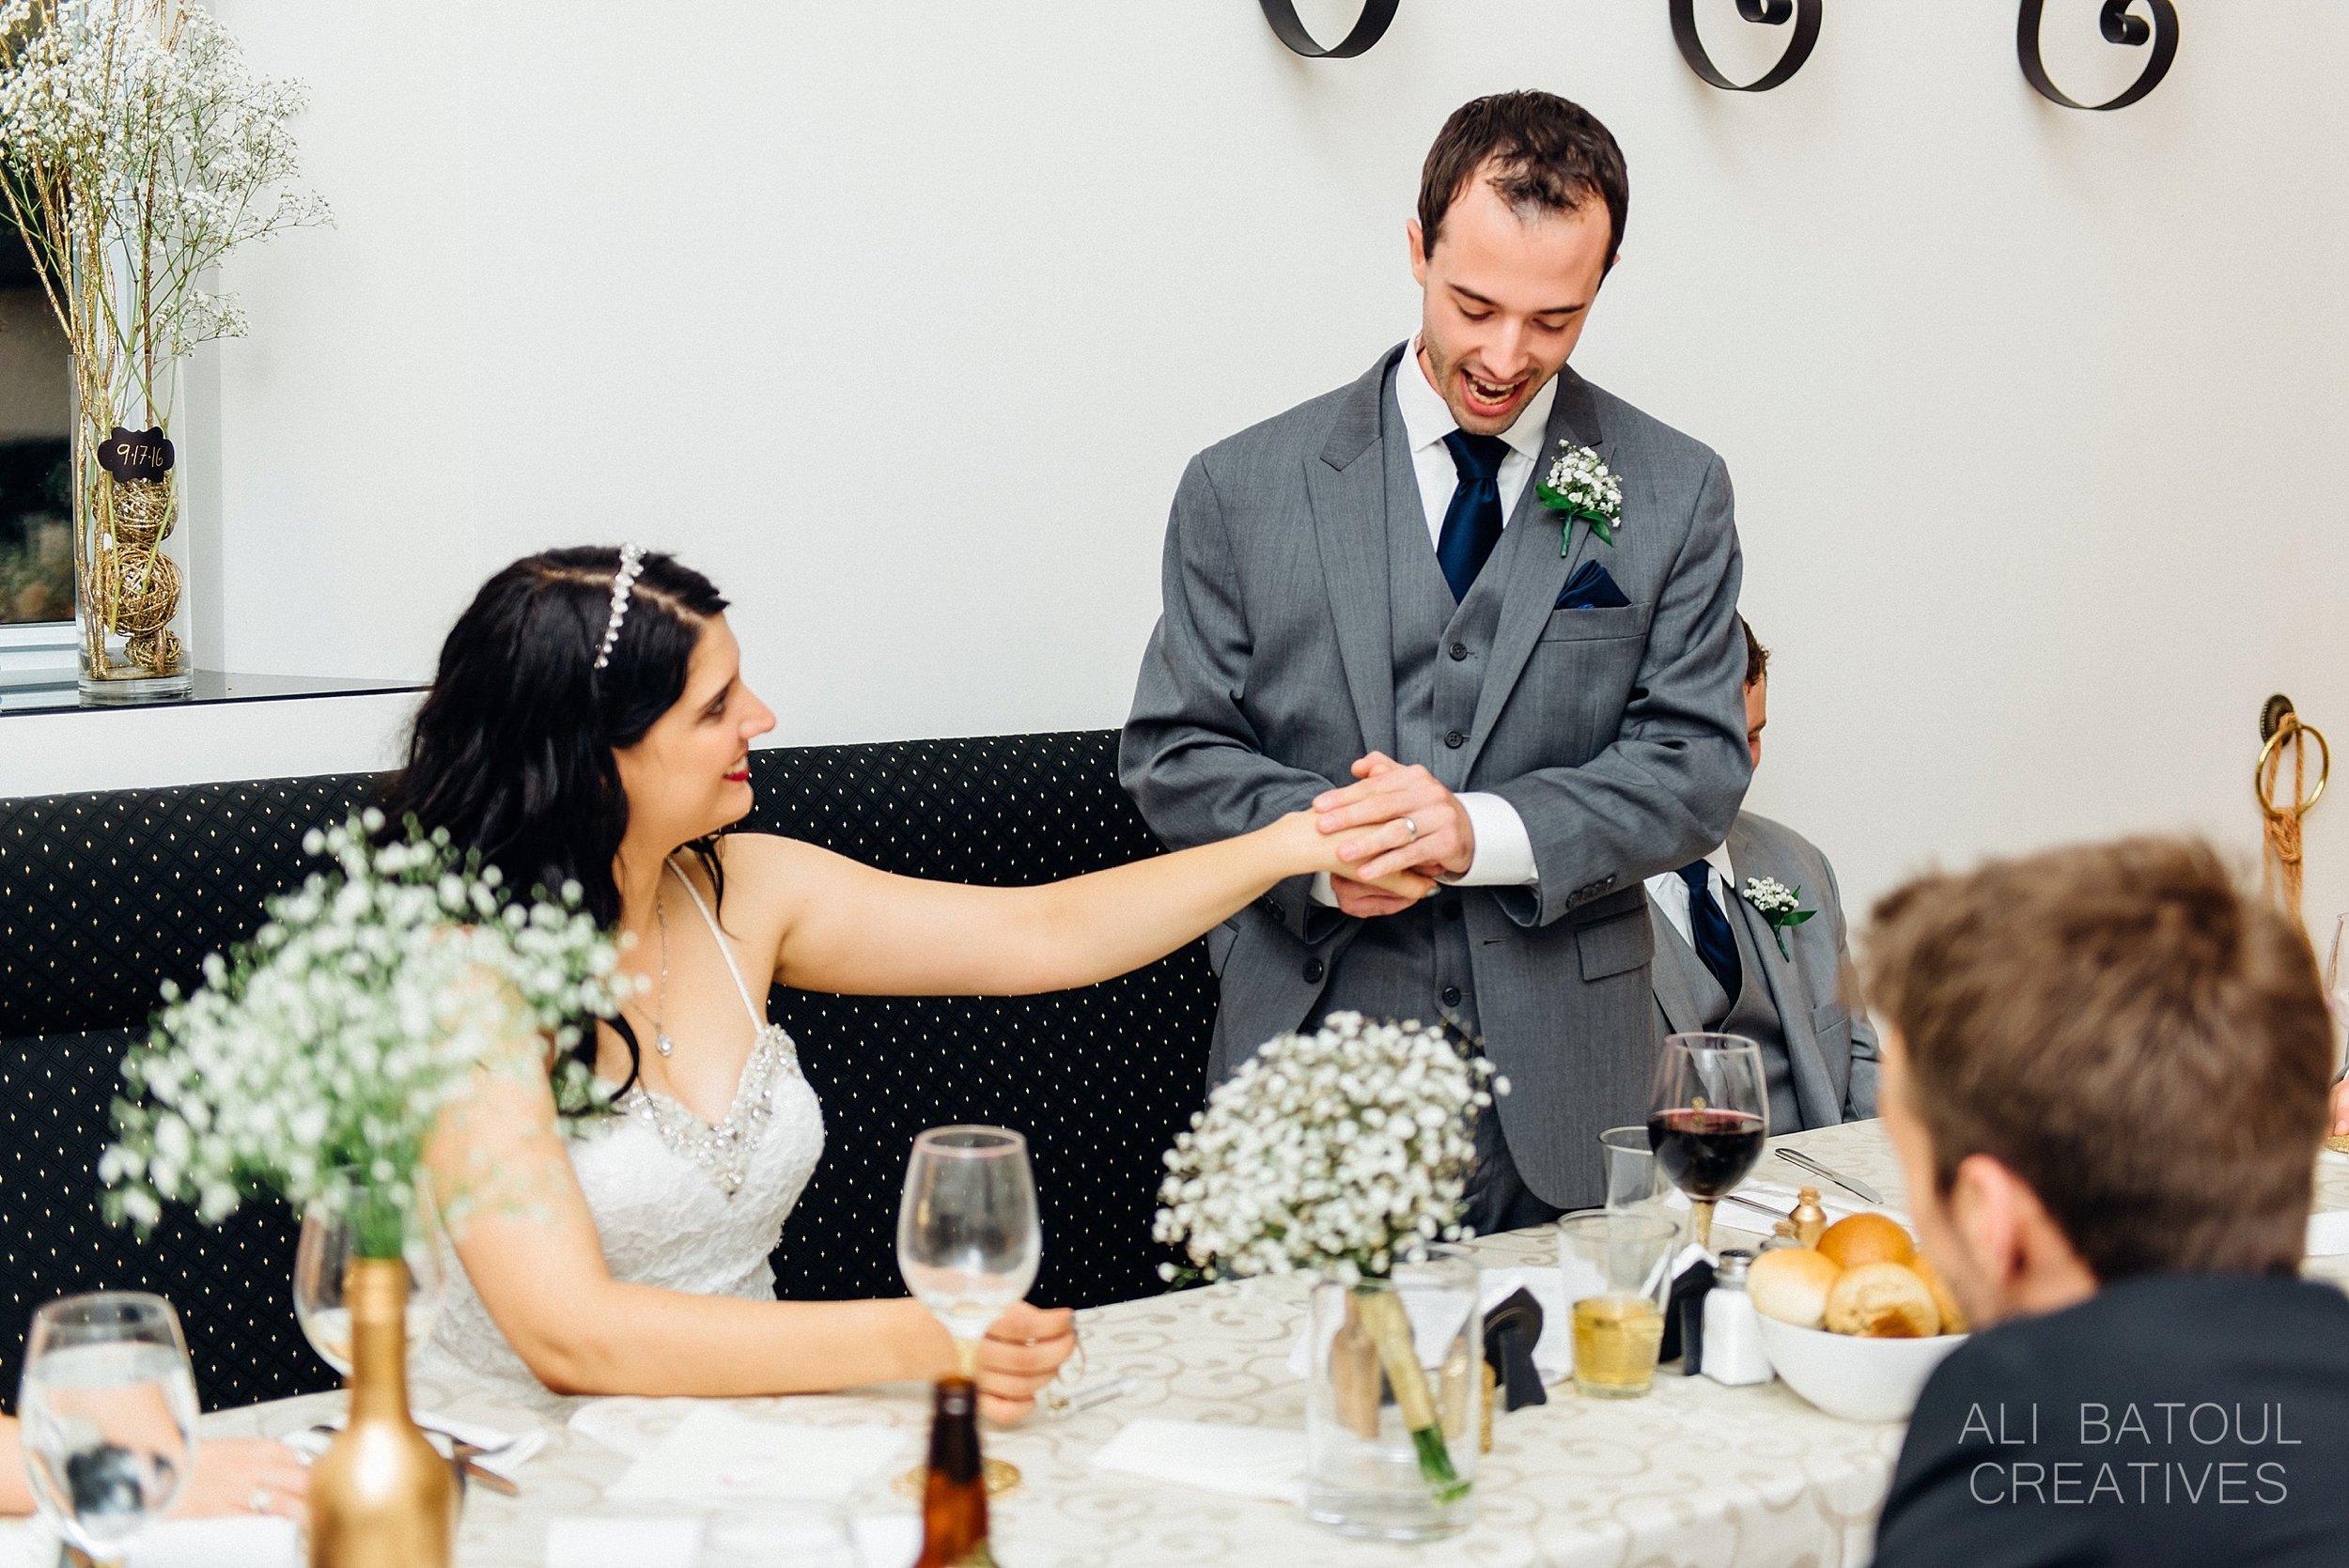 Jocelyn + Steve At The Schoolhouse Wedding - Ali and Batoul Fine Art Wedding Photography_0111.jpg